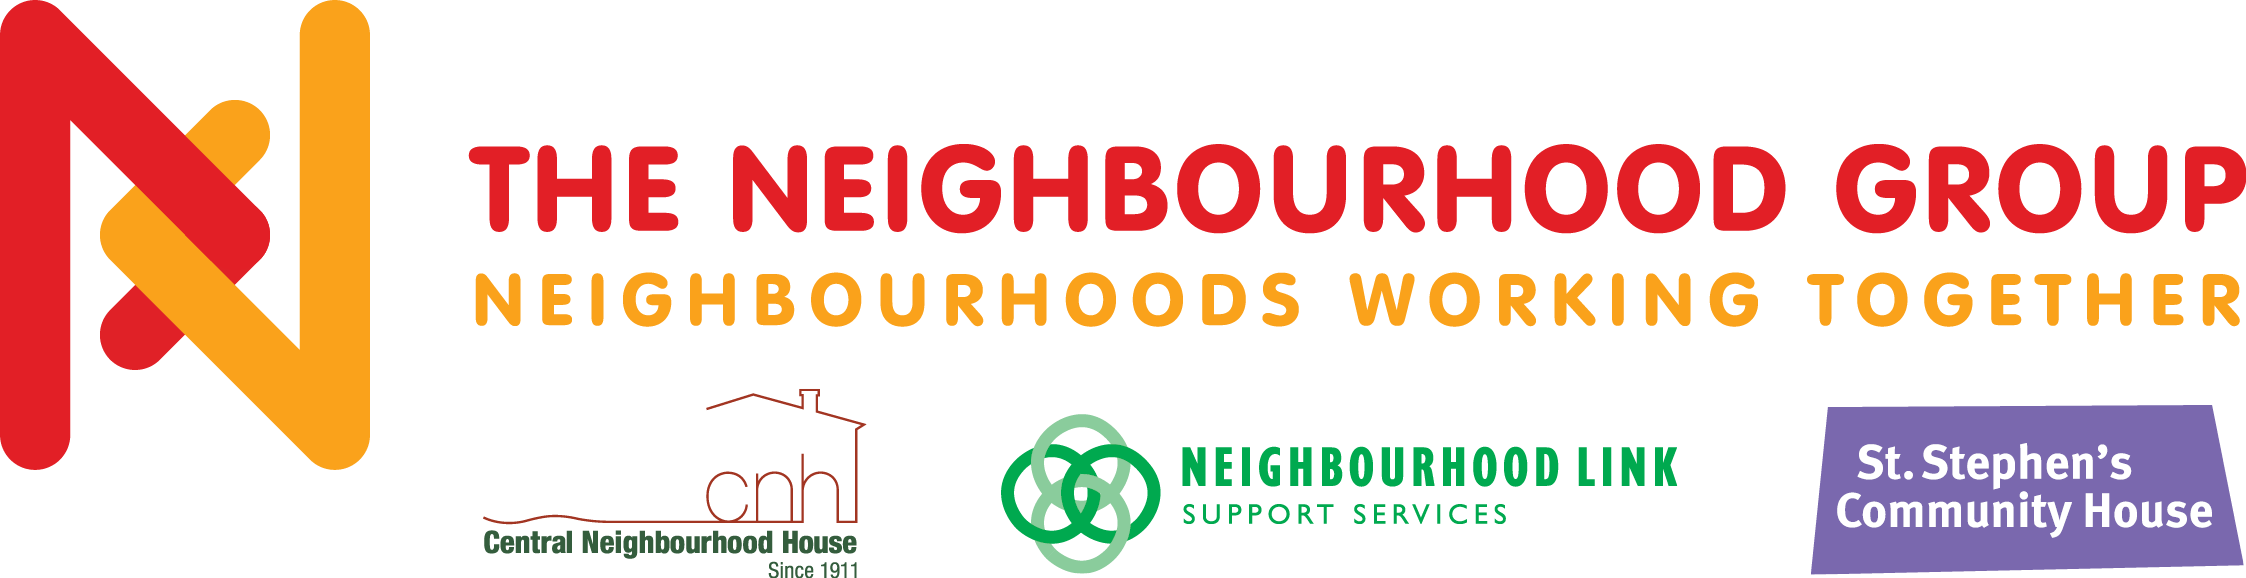 The Neighbourhood Group logo